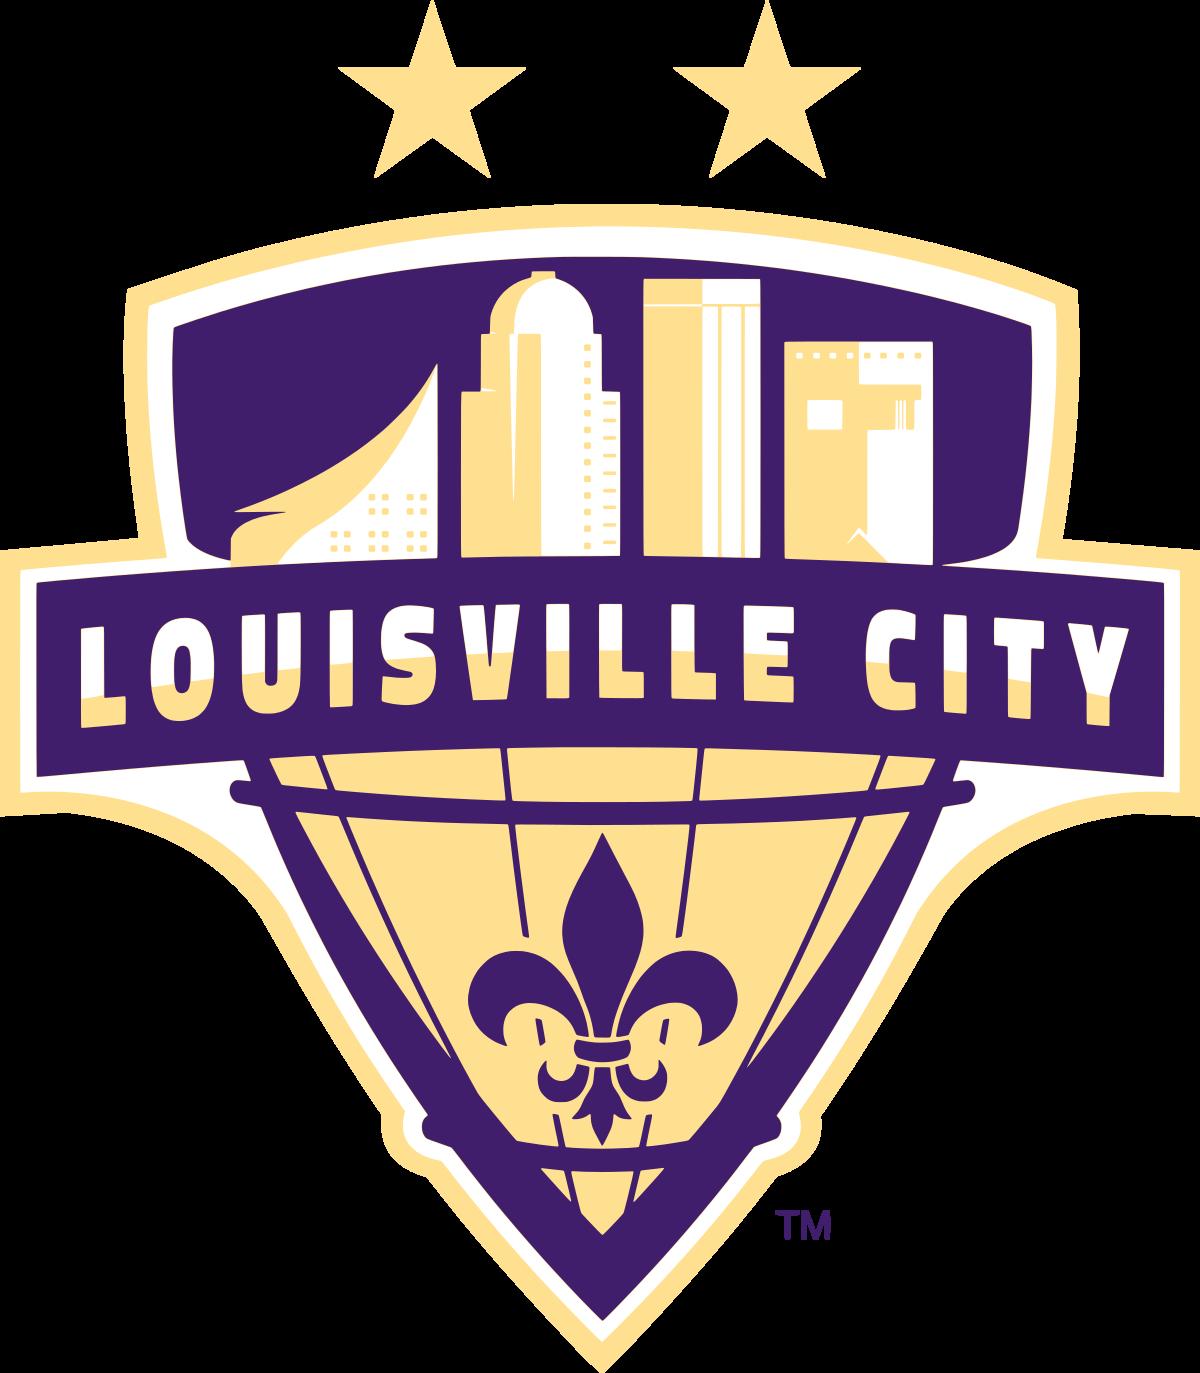 Louisville City FC logo